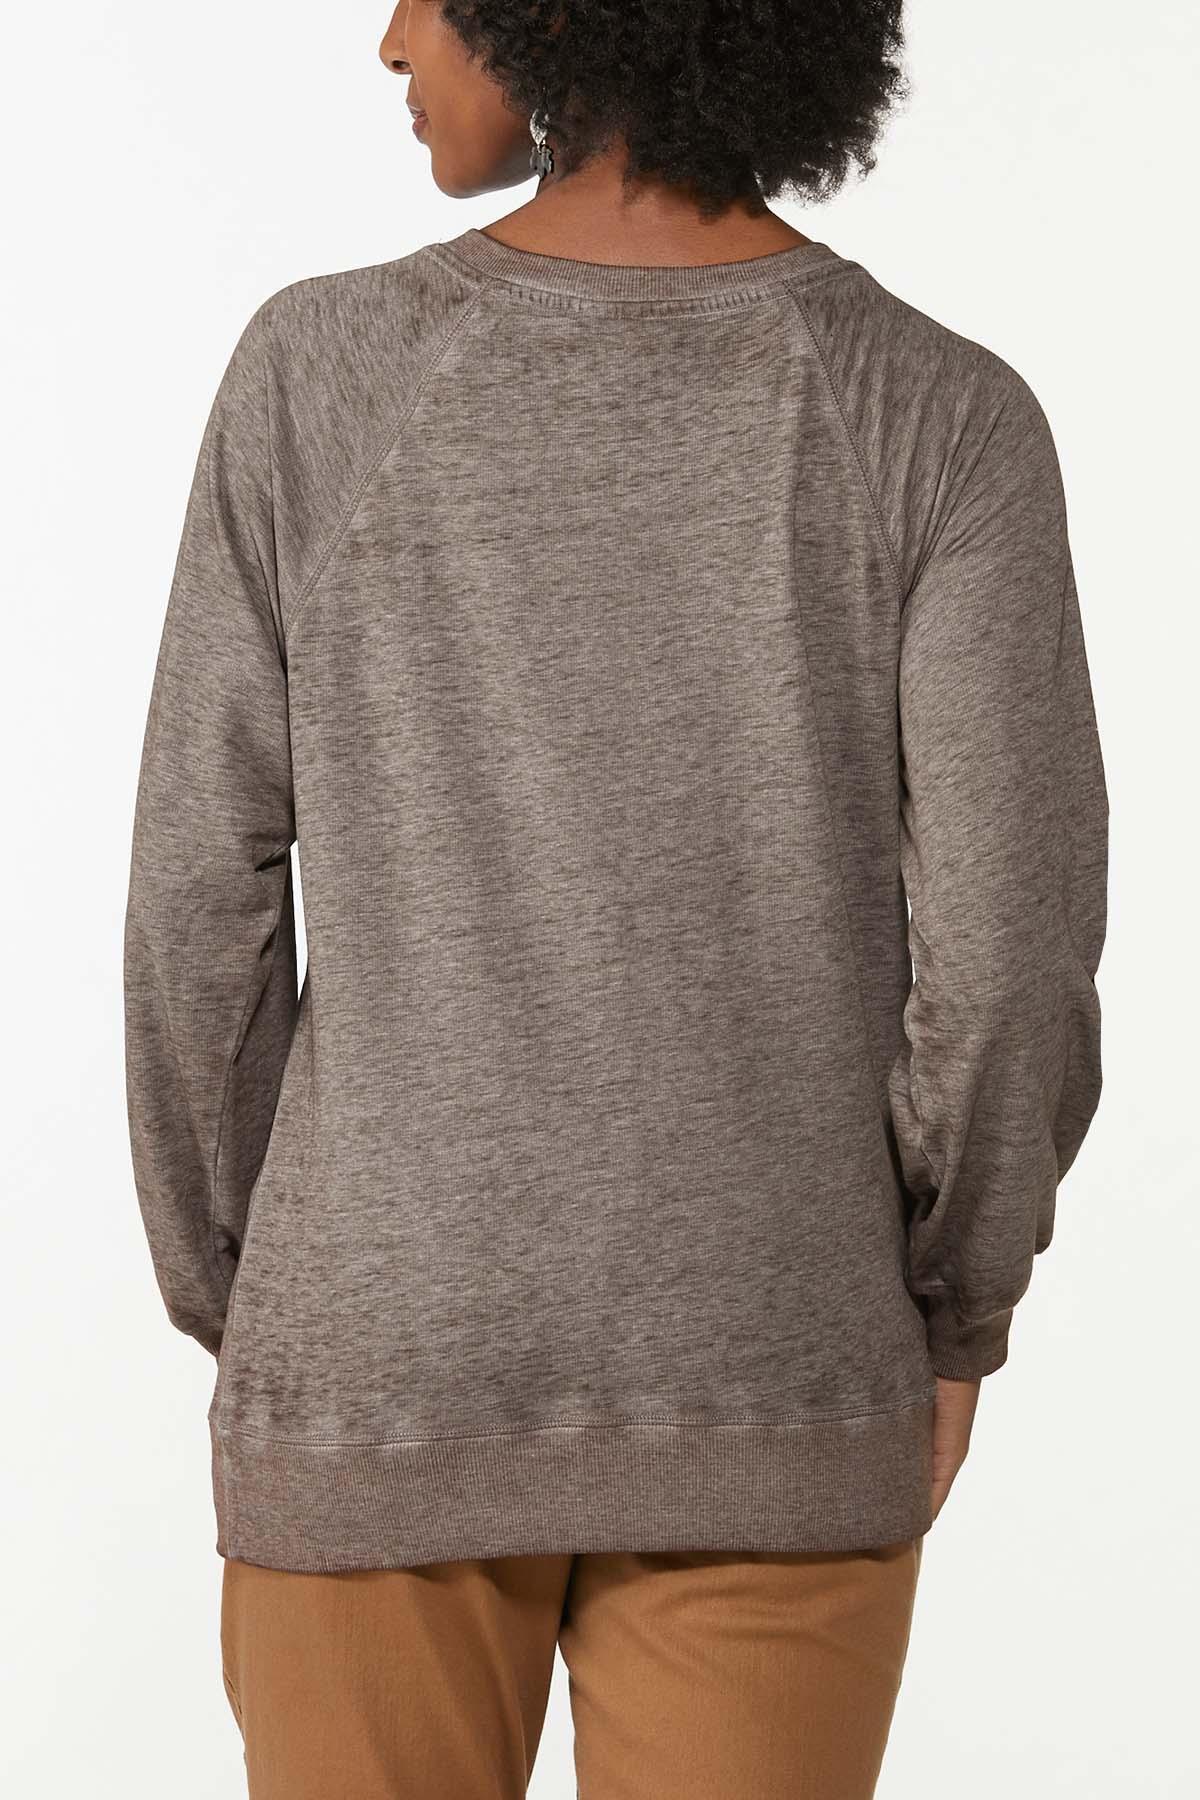 Glittery Thankful Sweatshirt (Item #44781719)